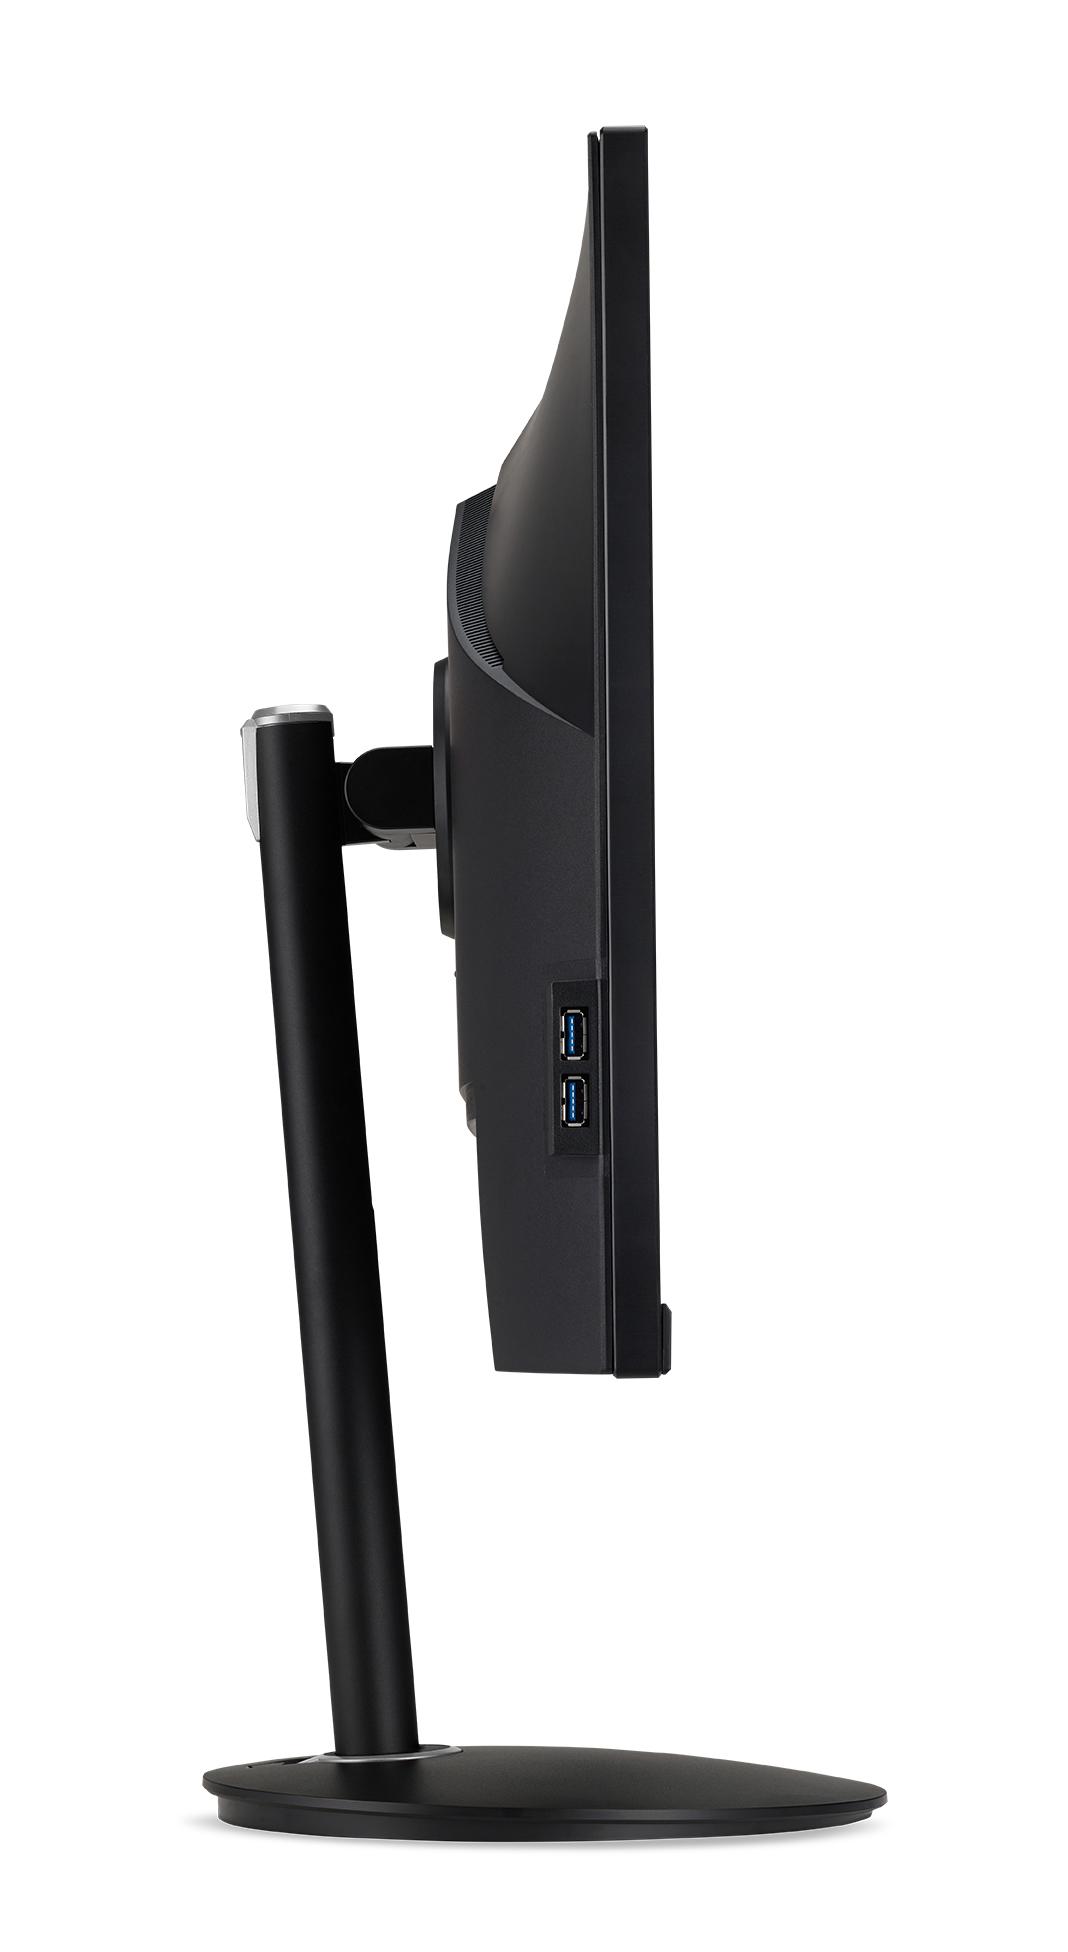 Acer Gaming Nitro XF272UPbmiiprzx, 27I QHD (2560x1440) - 144Hz Display-1ms, 2xHDMI/DP, USB3.0,Height adj.Pivot